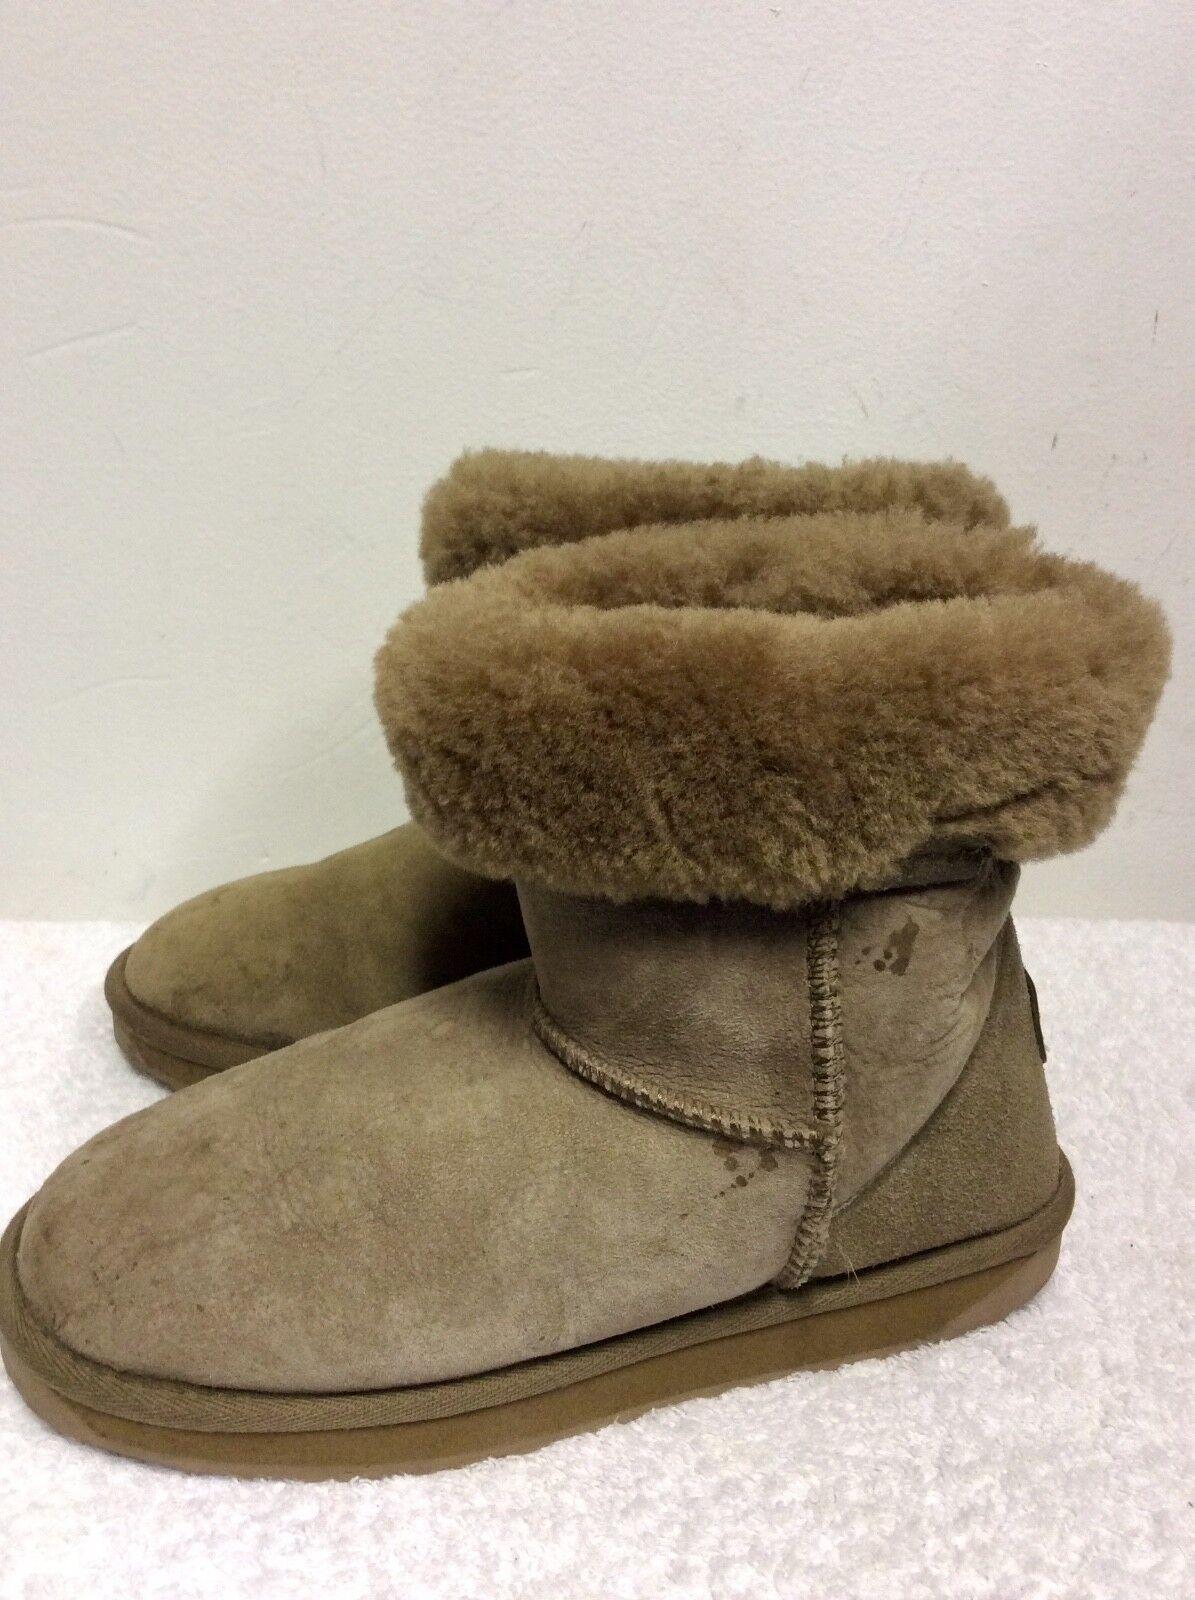 EMU STINGER LO LO LO LIGHT braun SHEEPSKIN FUR LINED ANKLE Stiefel Größe 6 39 COST a00915